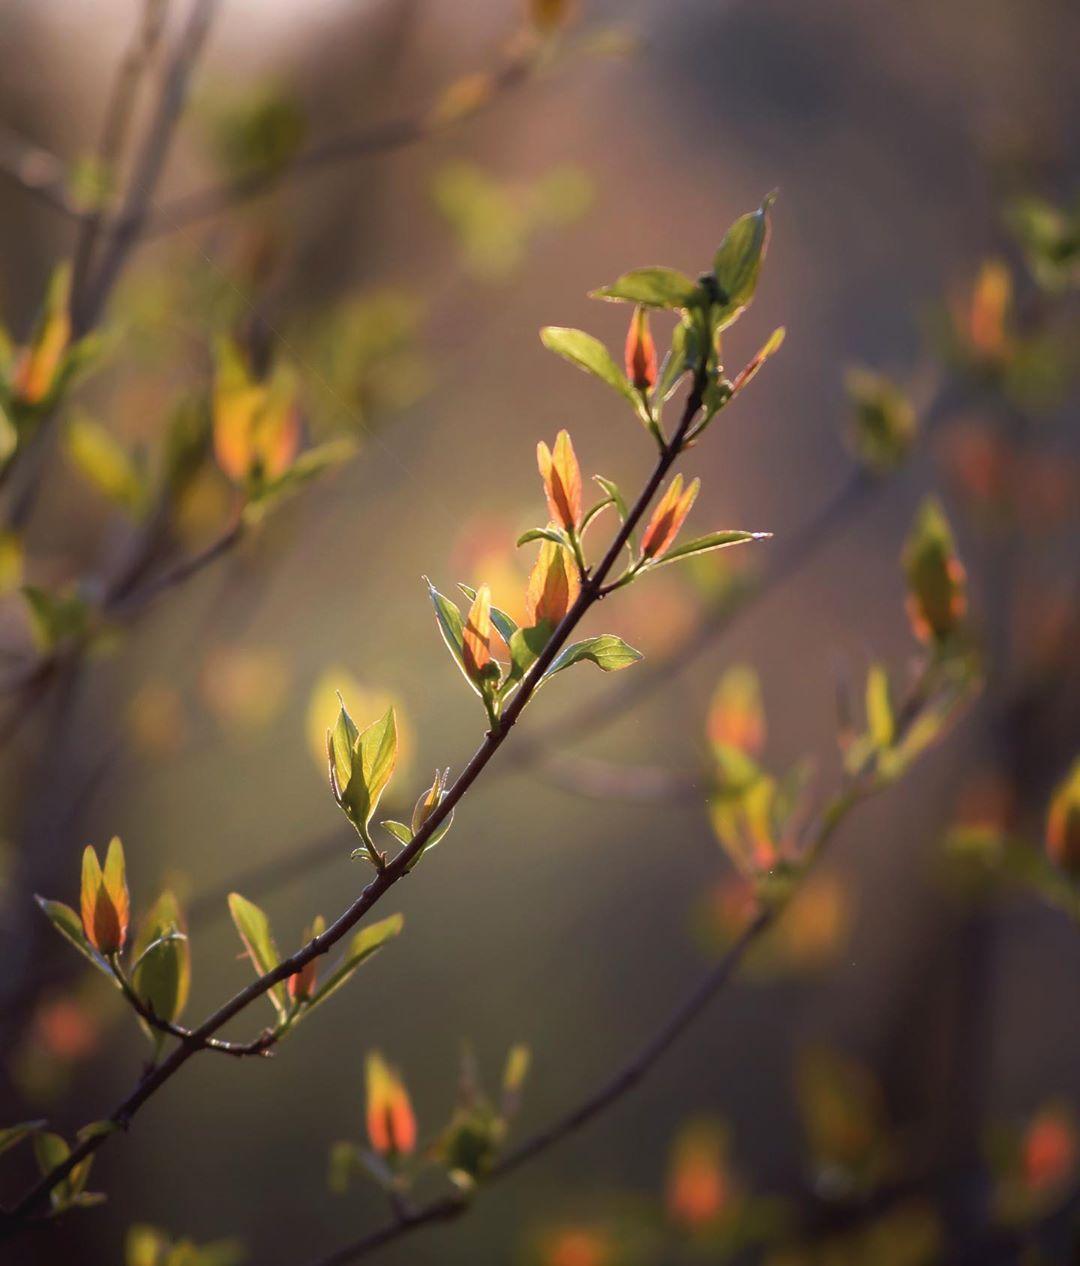 flower, light, inspiring, nature, water, gradient, sunset, serene, stillness